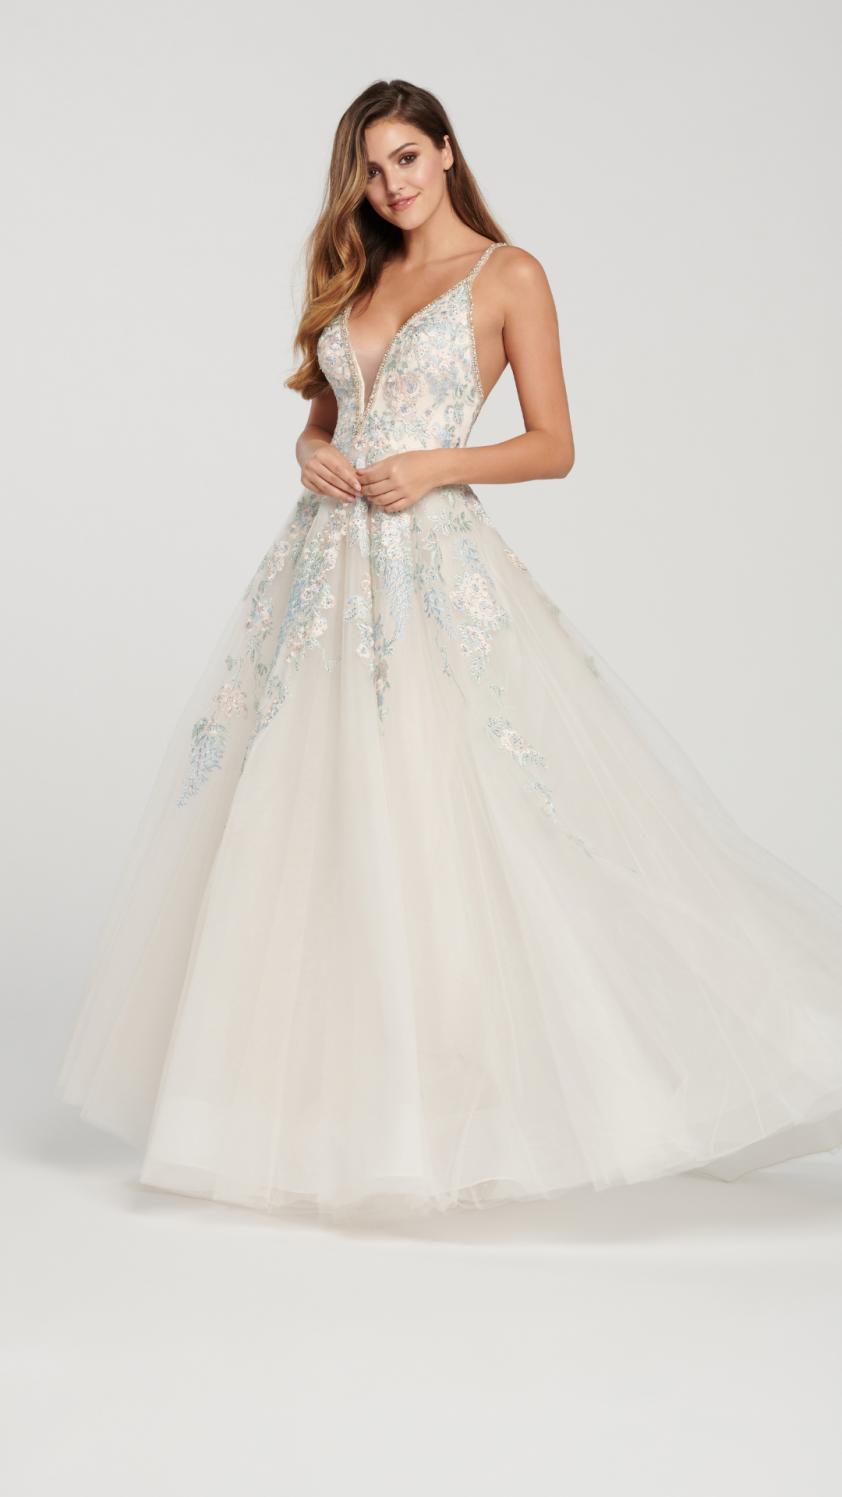 Wedding Dress MCP010911WEPROM - Dominique Levesque Bridal